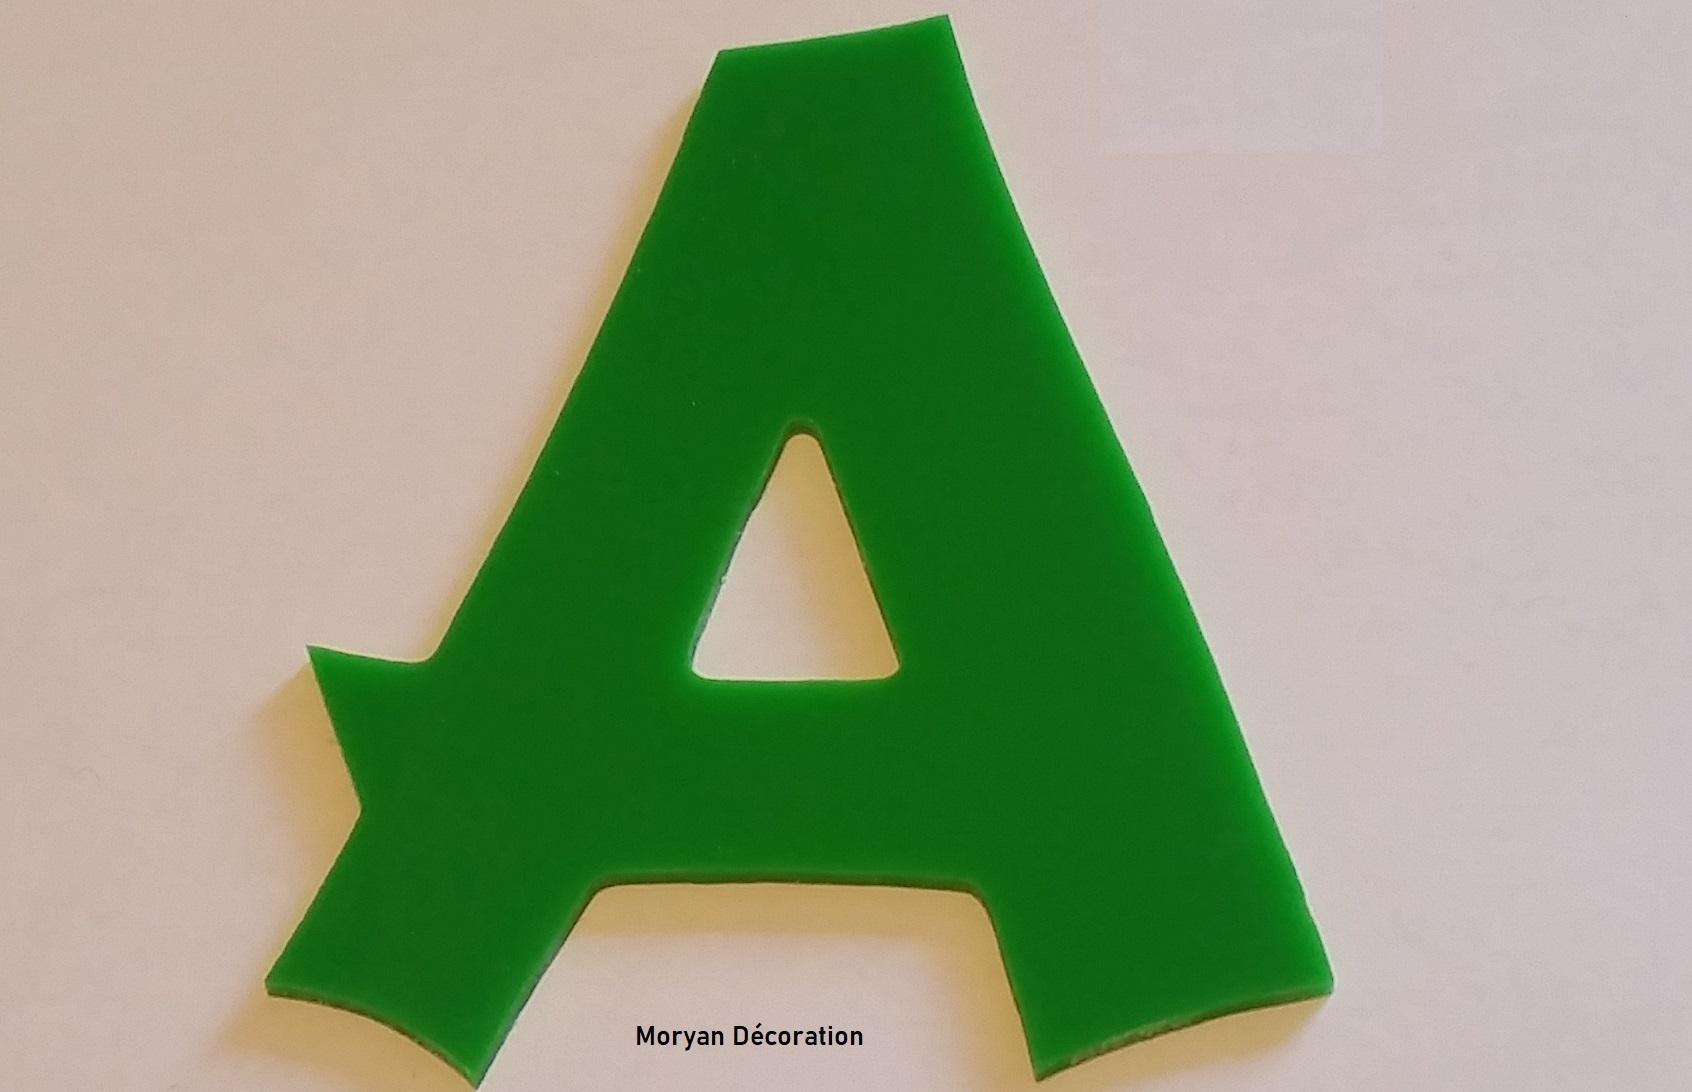 Lettre decorative plexi cancun